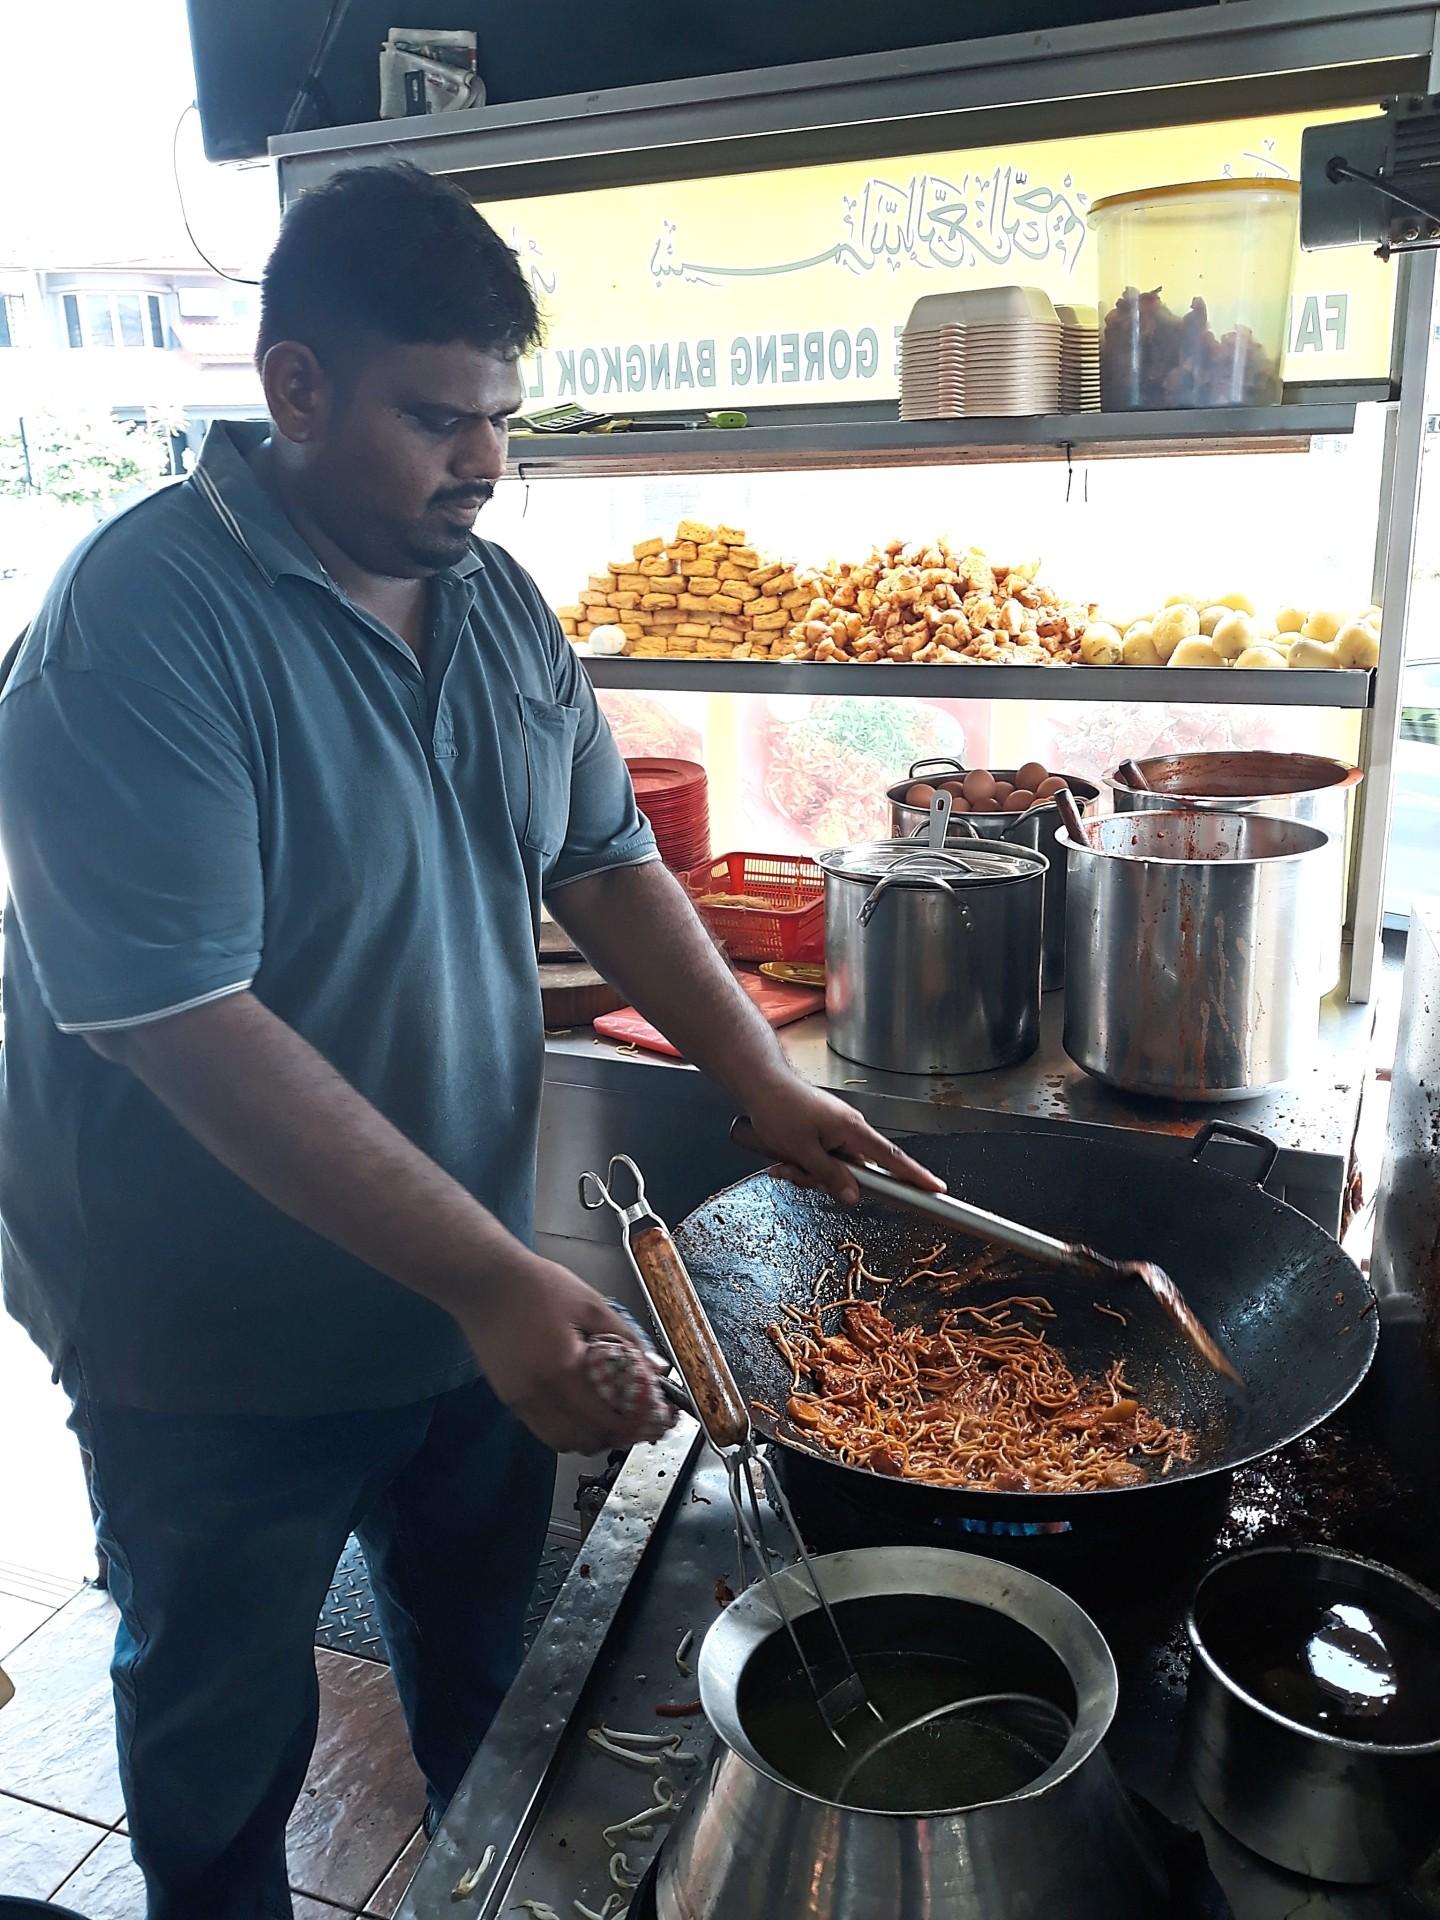 Bashir is a third generation cook who runs the Penang Bangkok Lane mee goreng stall in USJ2.